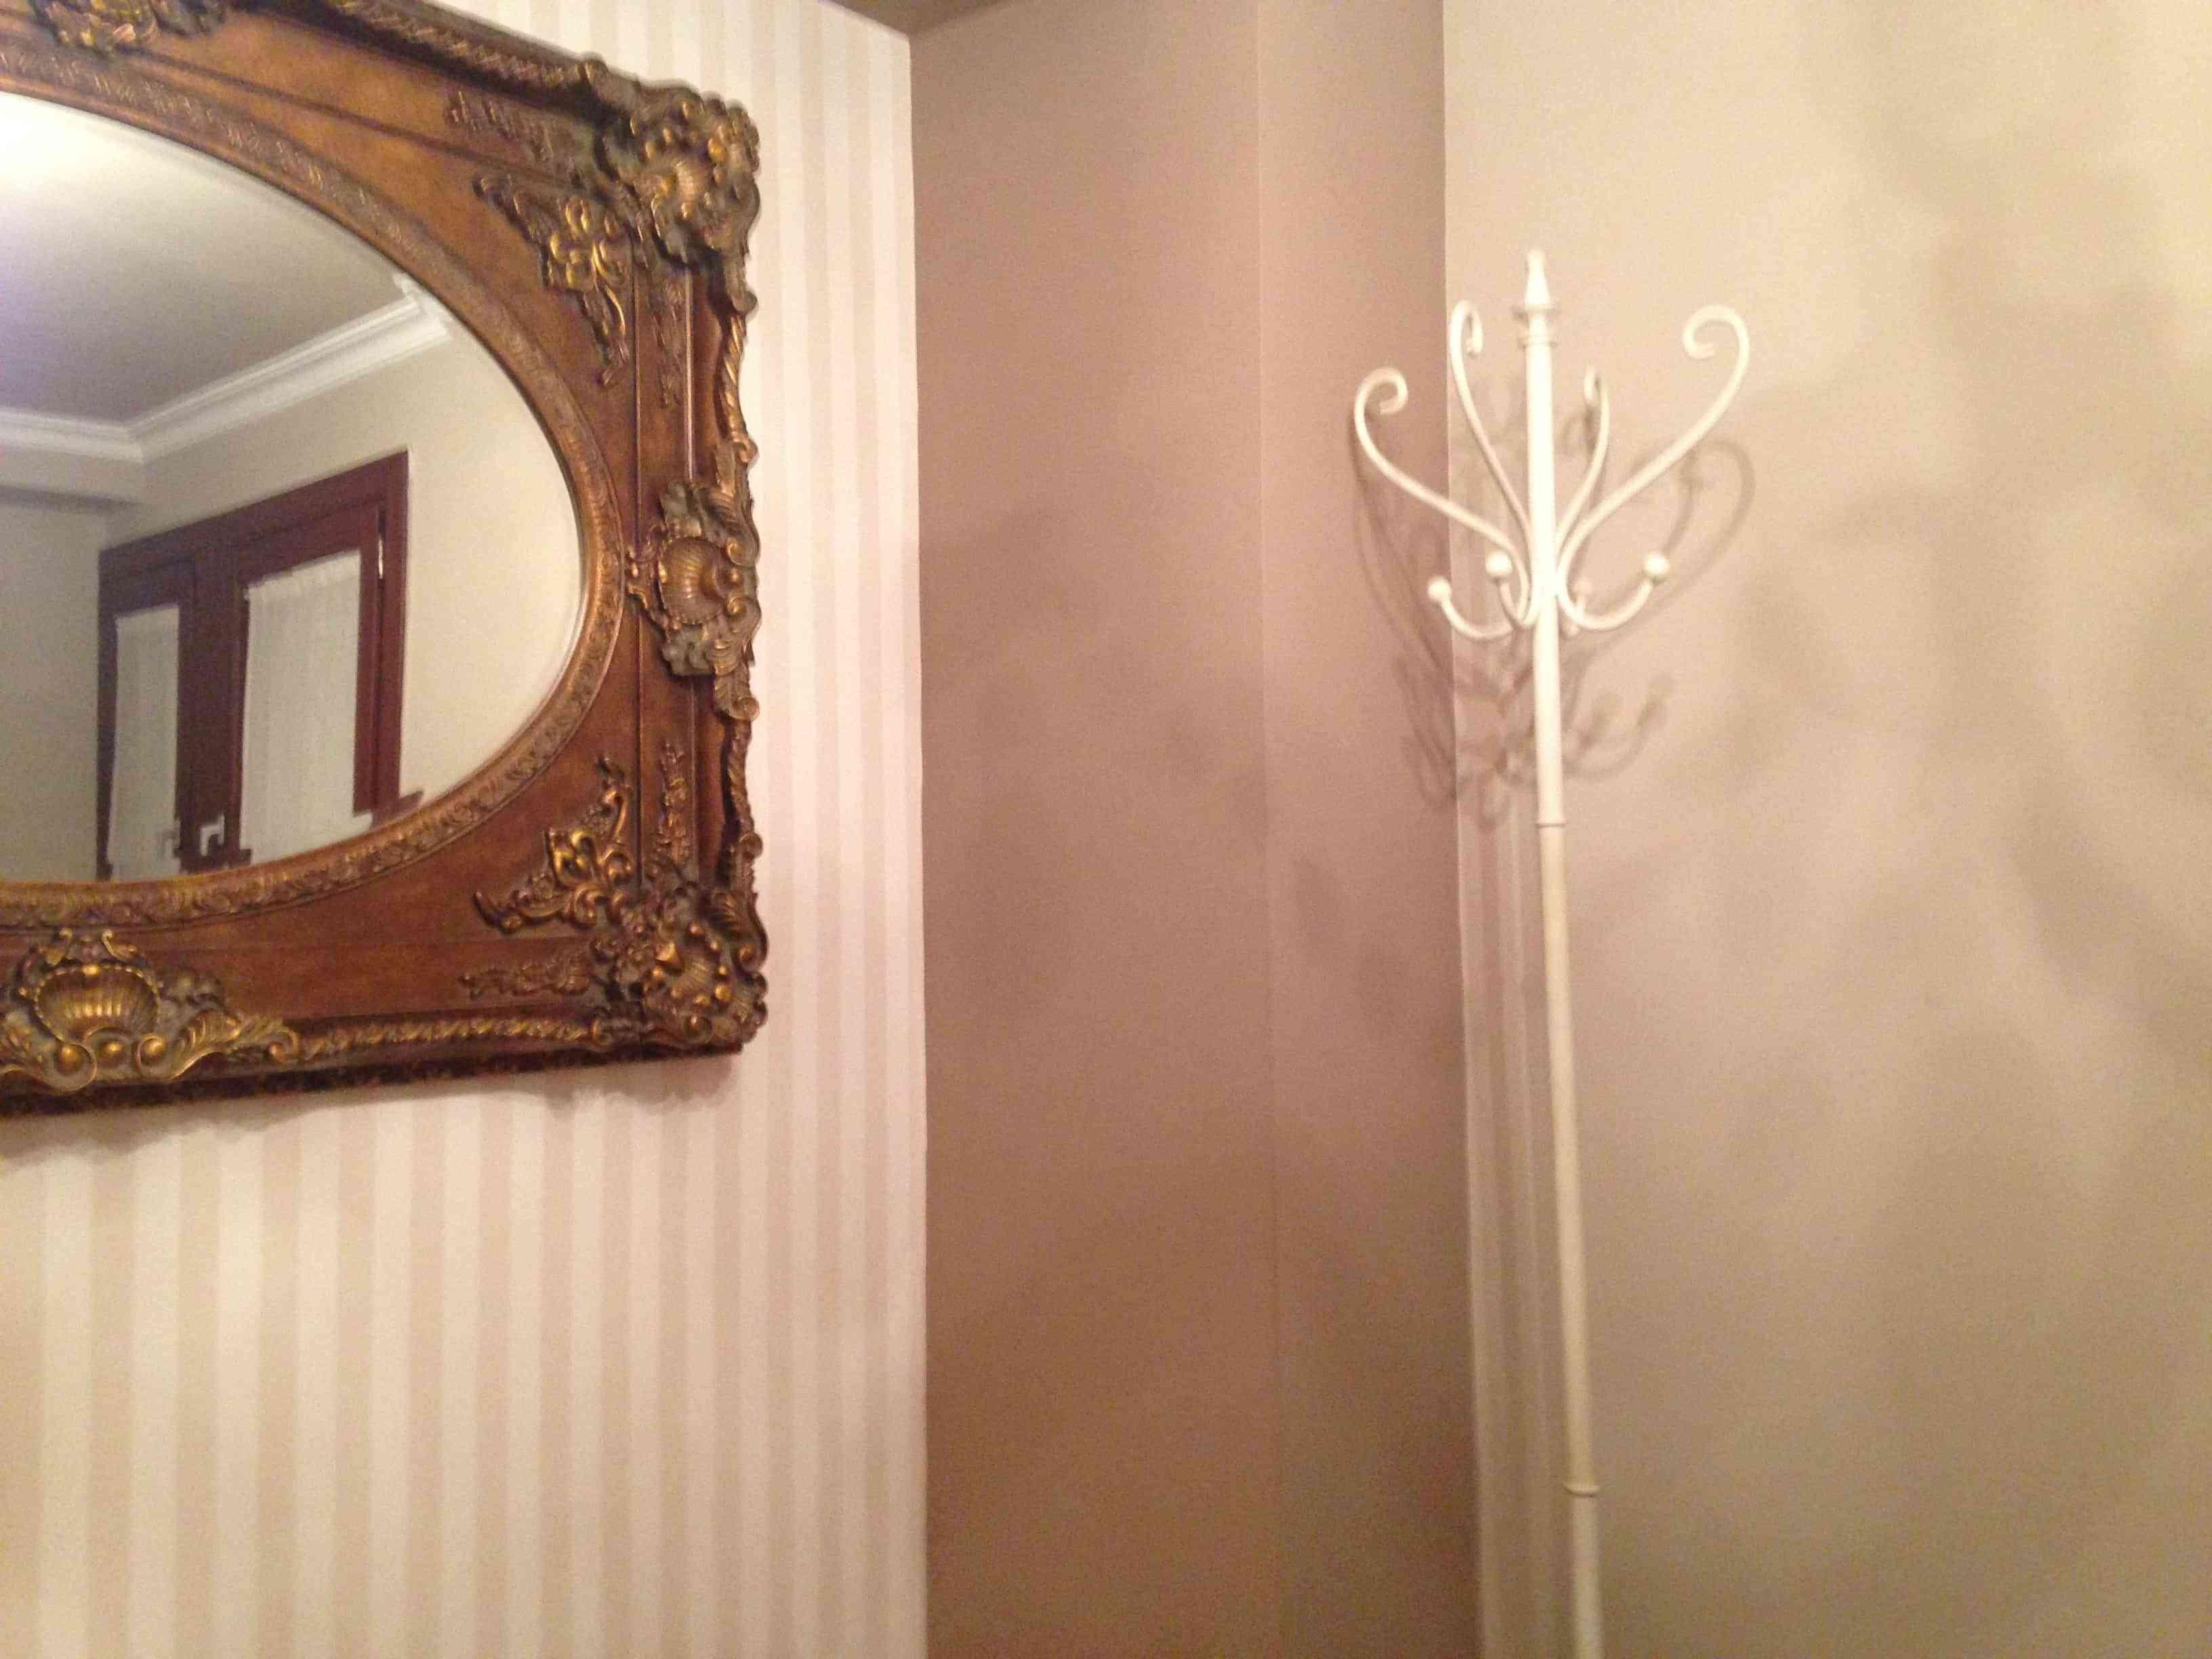 decoracion paredes - beis - rayas verticales